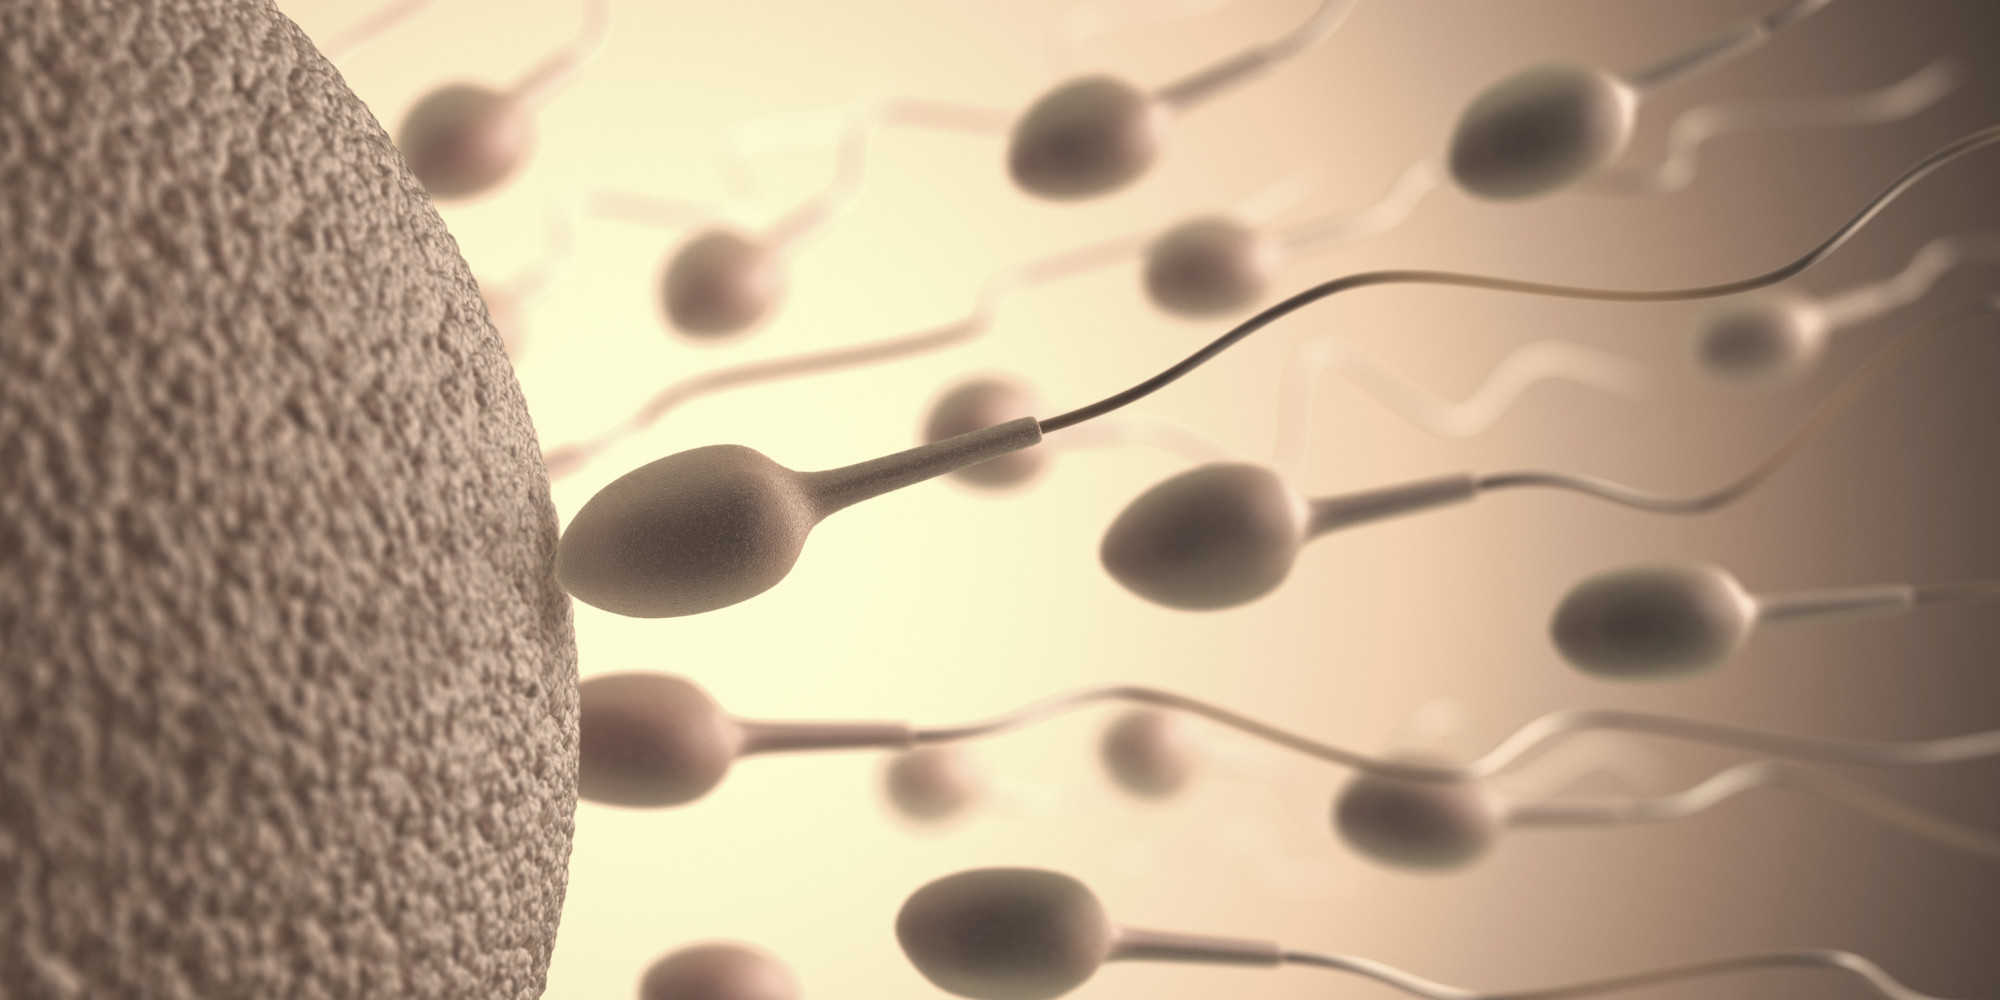 Cuál es la vida media de un espermatozoide 1